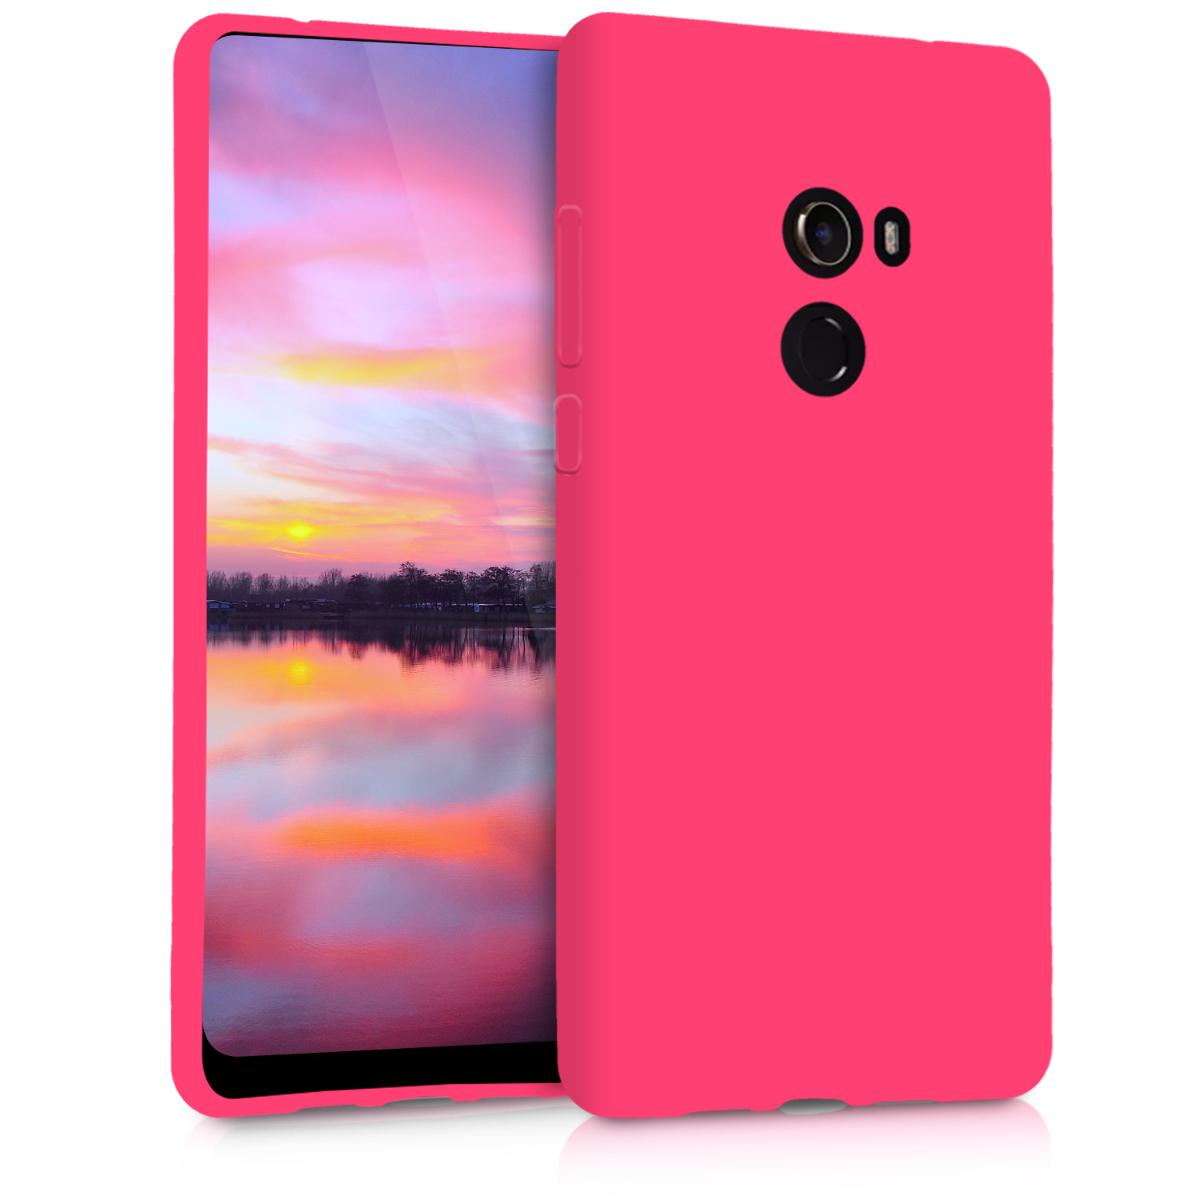 KW Θήκη Σιλικόνης Xiaomi Mi Mix 2 - Neon Pink (45183.77)